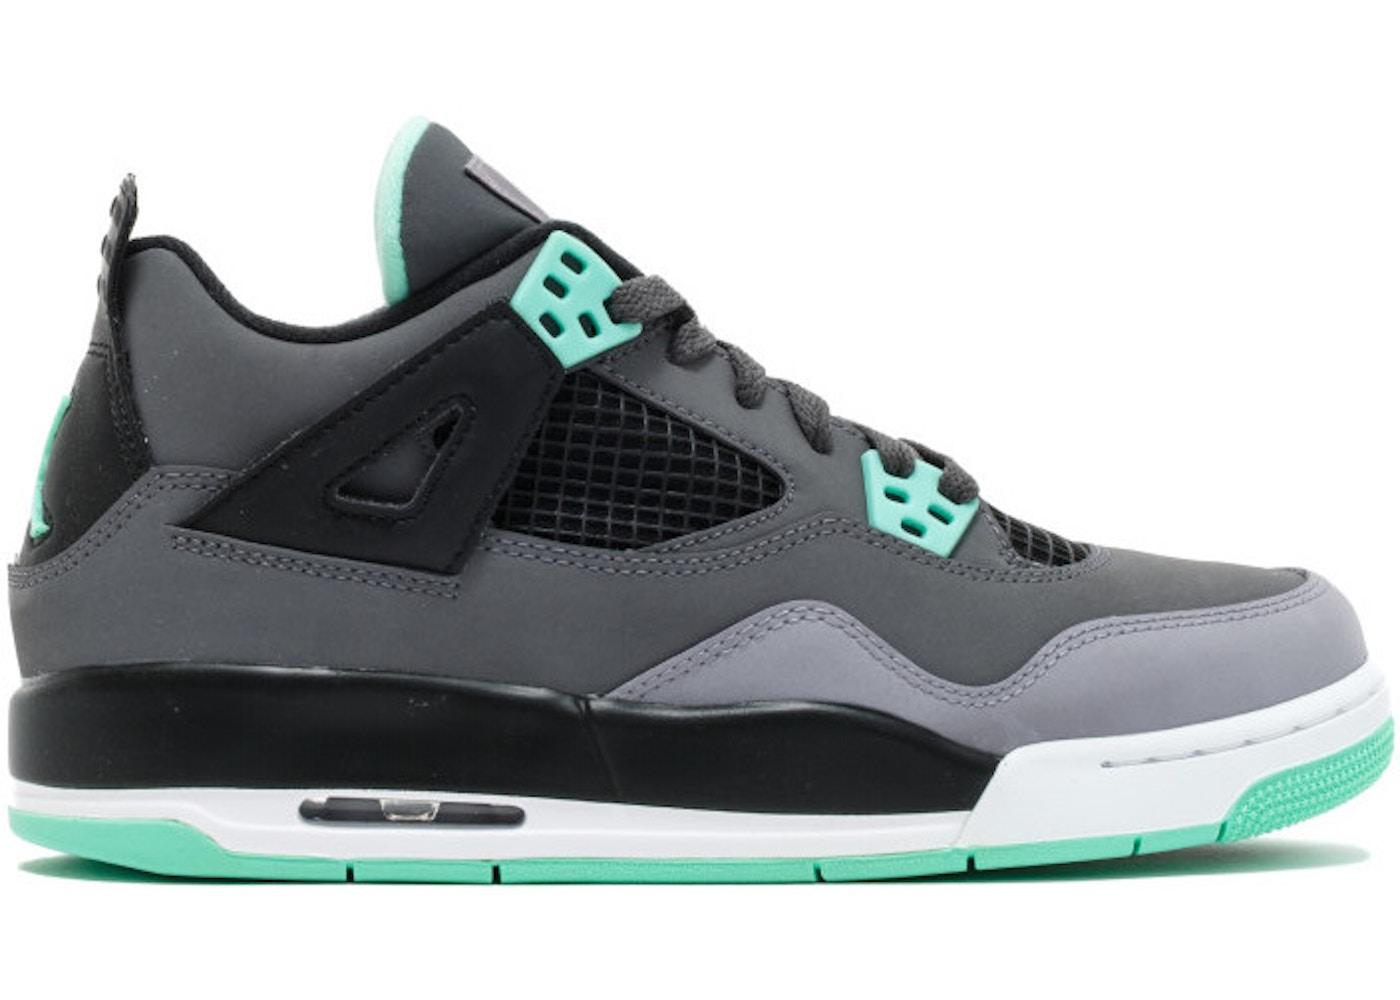 newest 07ca7 93618 Jordan 4 Retro Green Glow (GS) - 408452-033